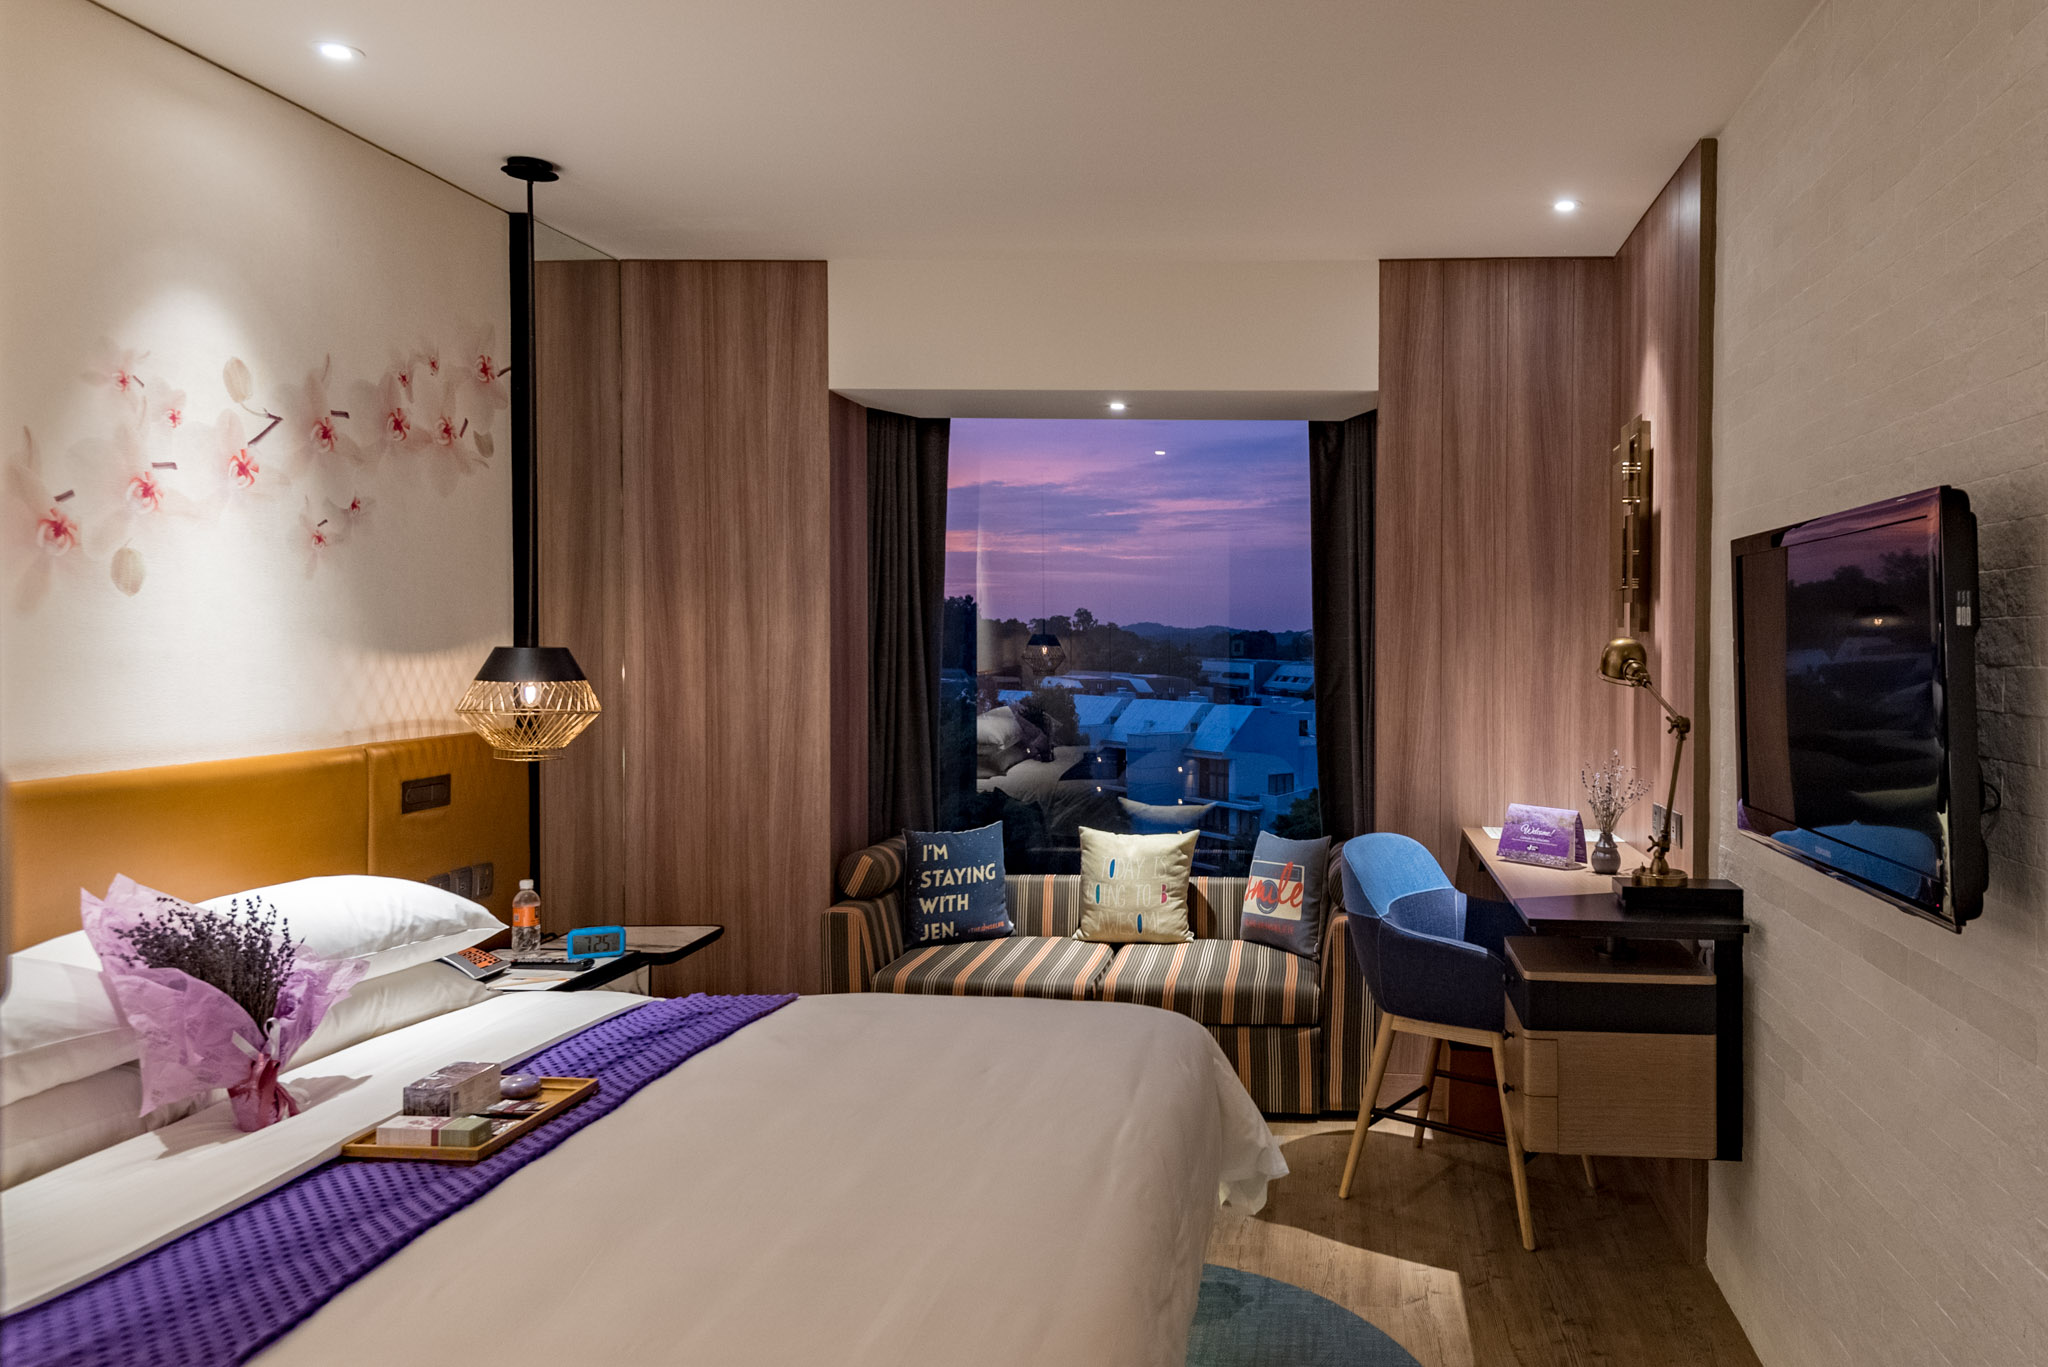 Lavender Spa Staycation at Hotel Jen Tanglin Singapore